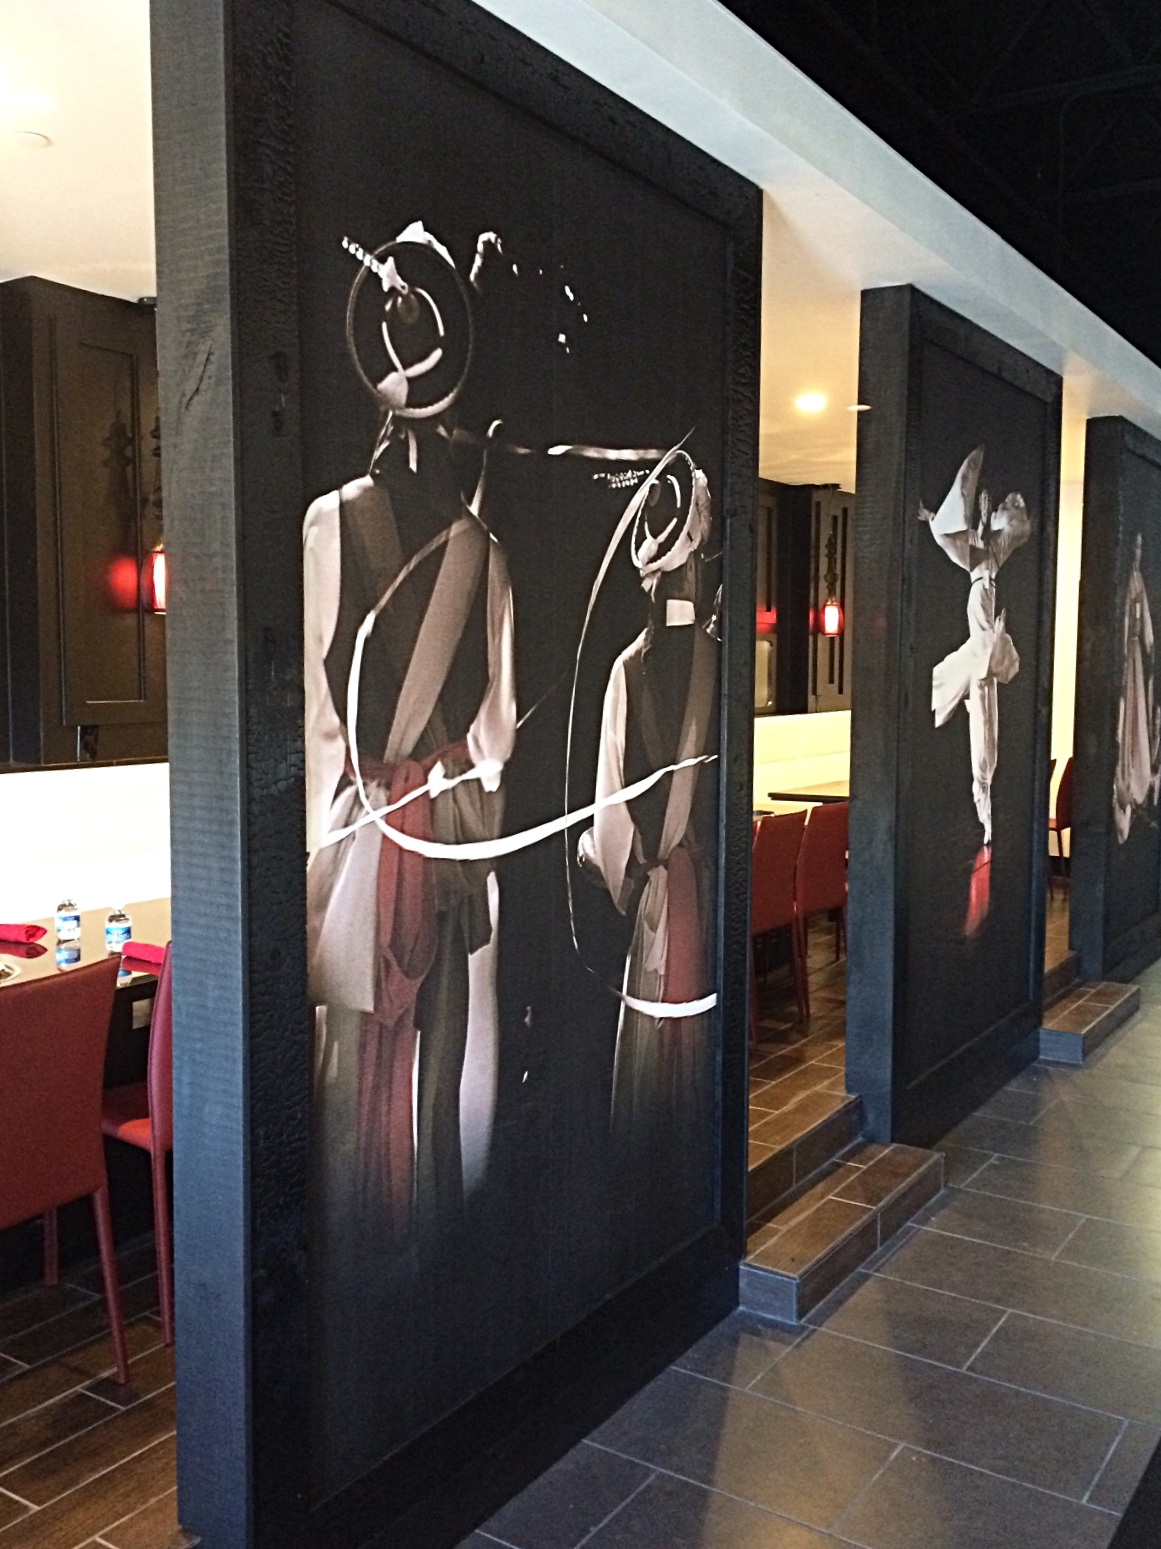 Breakers Habachy Designs Eutree Forest Free Shou Sugi Ban charred dark wood board frames